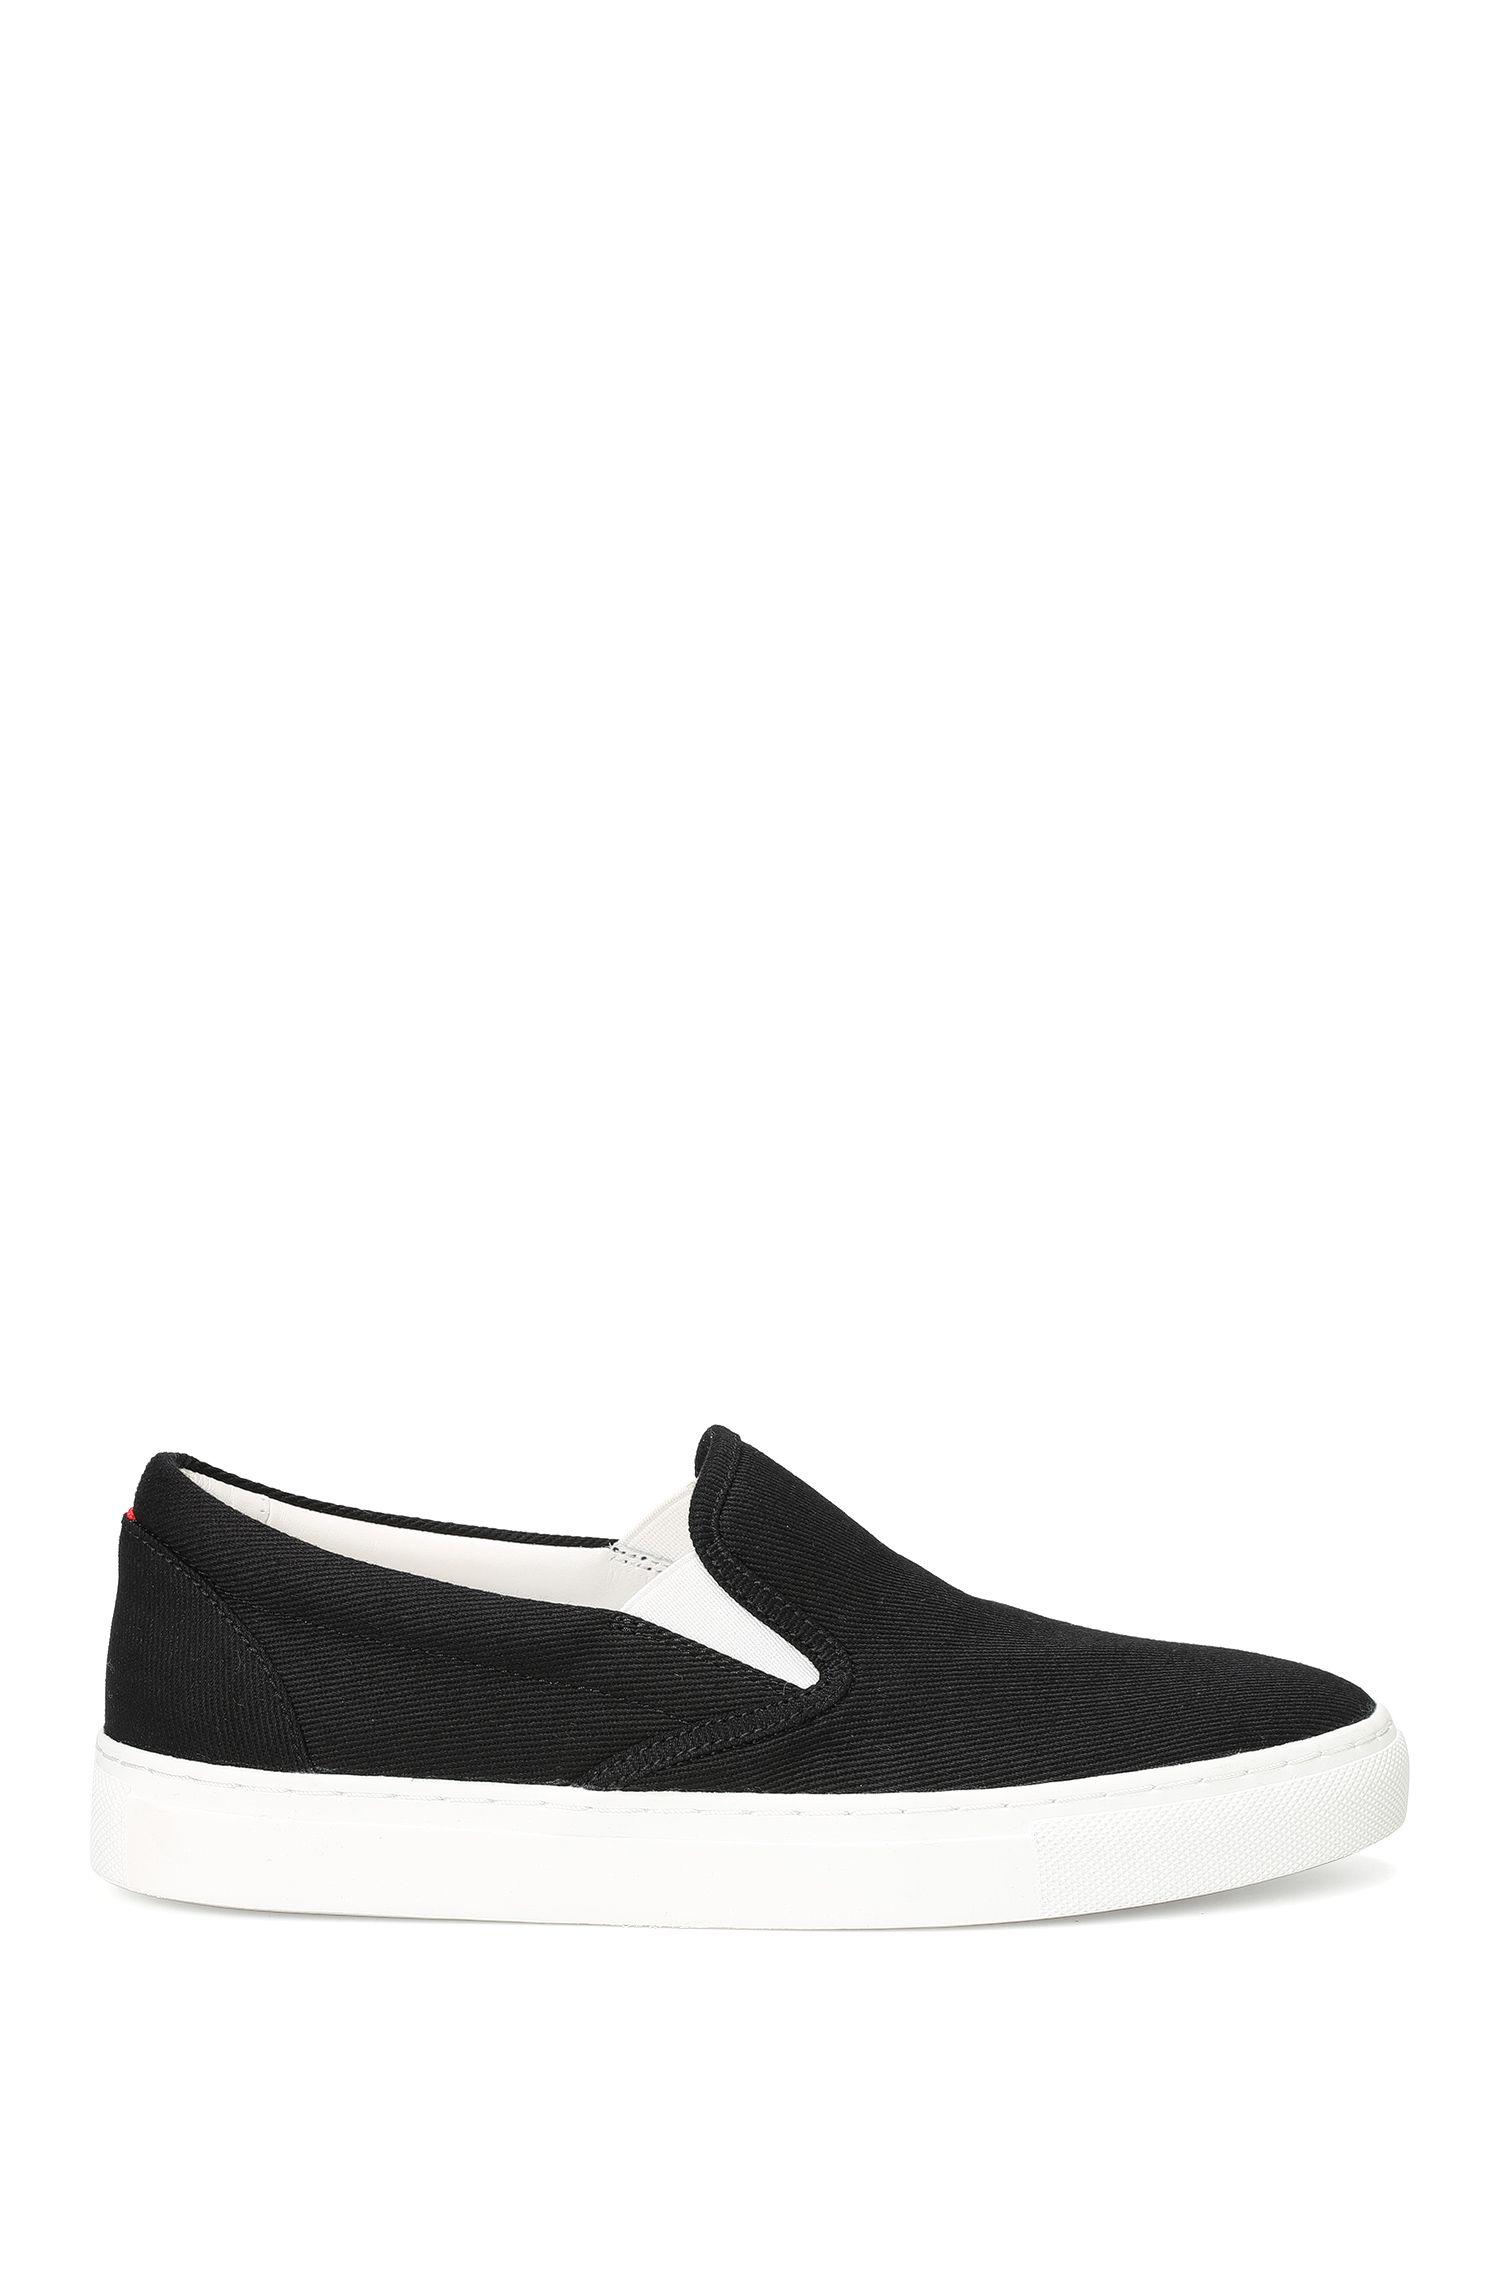 Schnürlose Sneakers aus Baumwolle: 'Cleah-F'